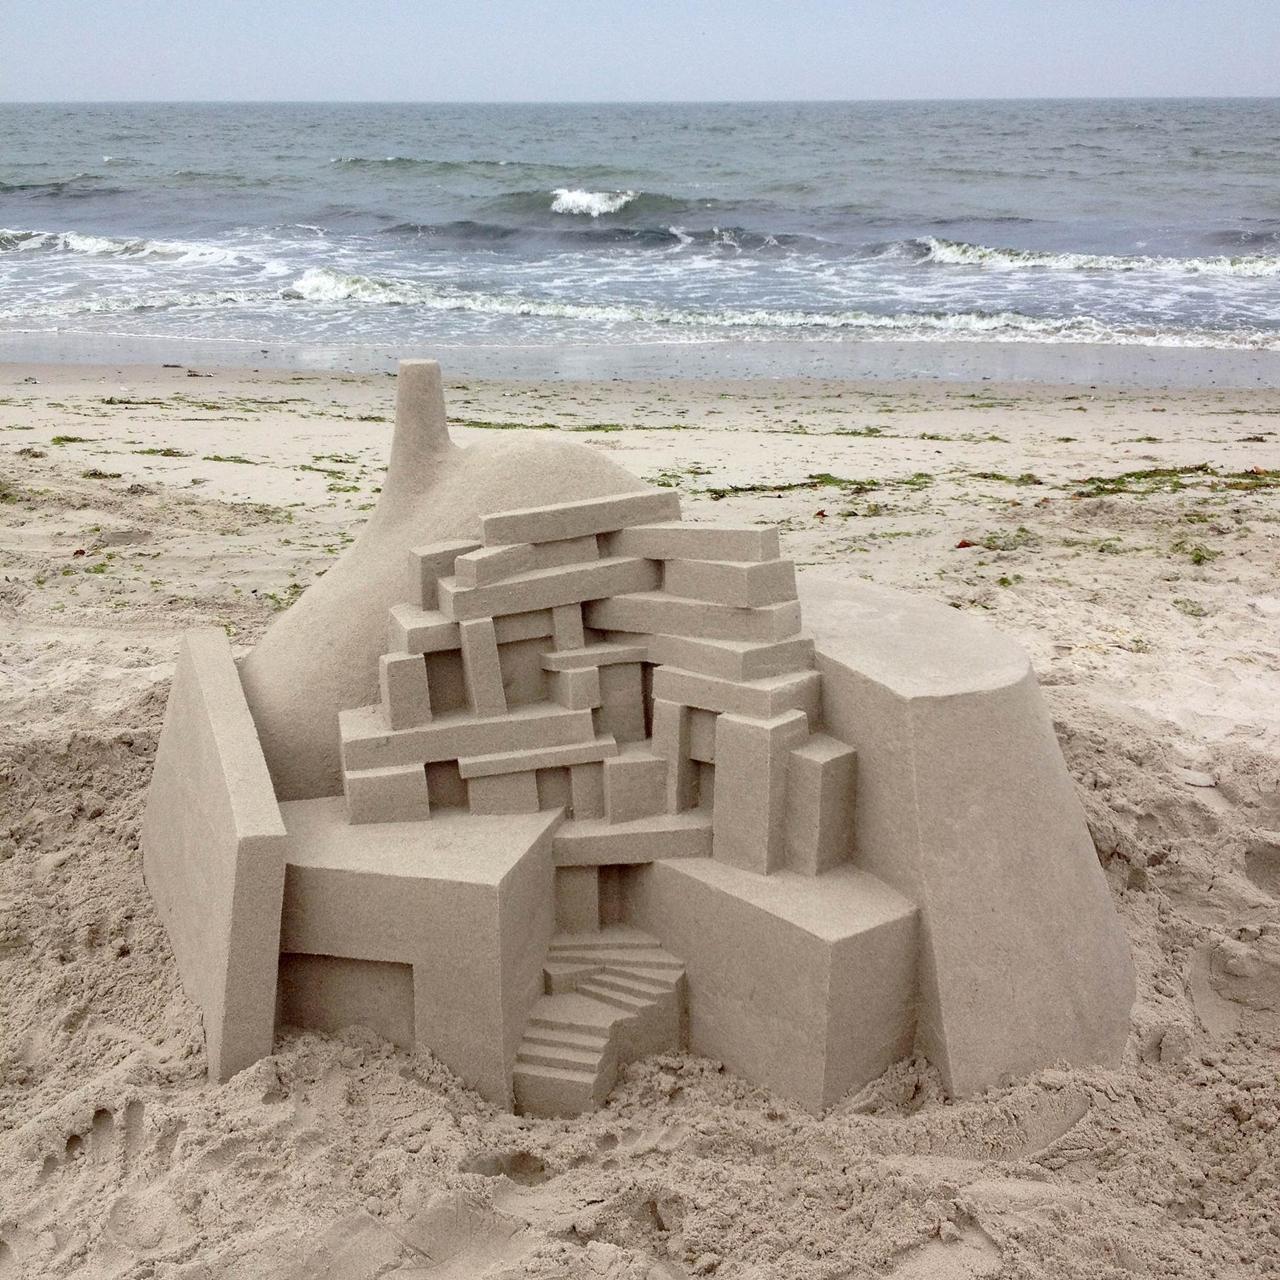 sand-castles-10